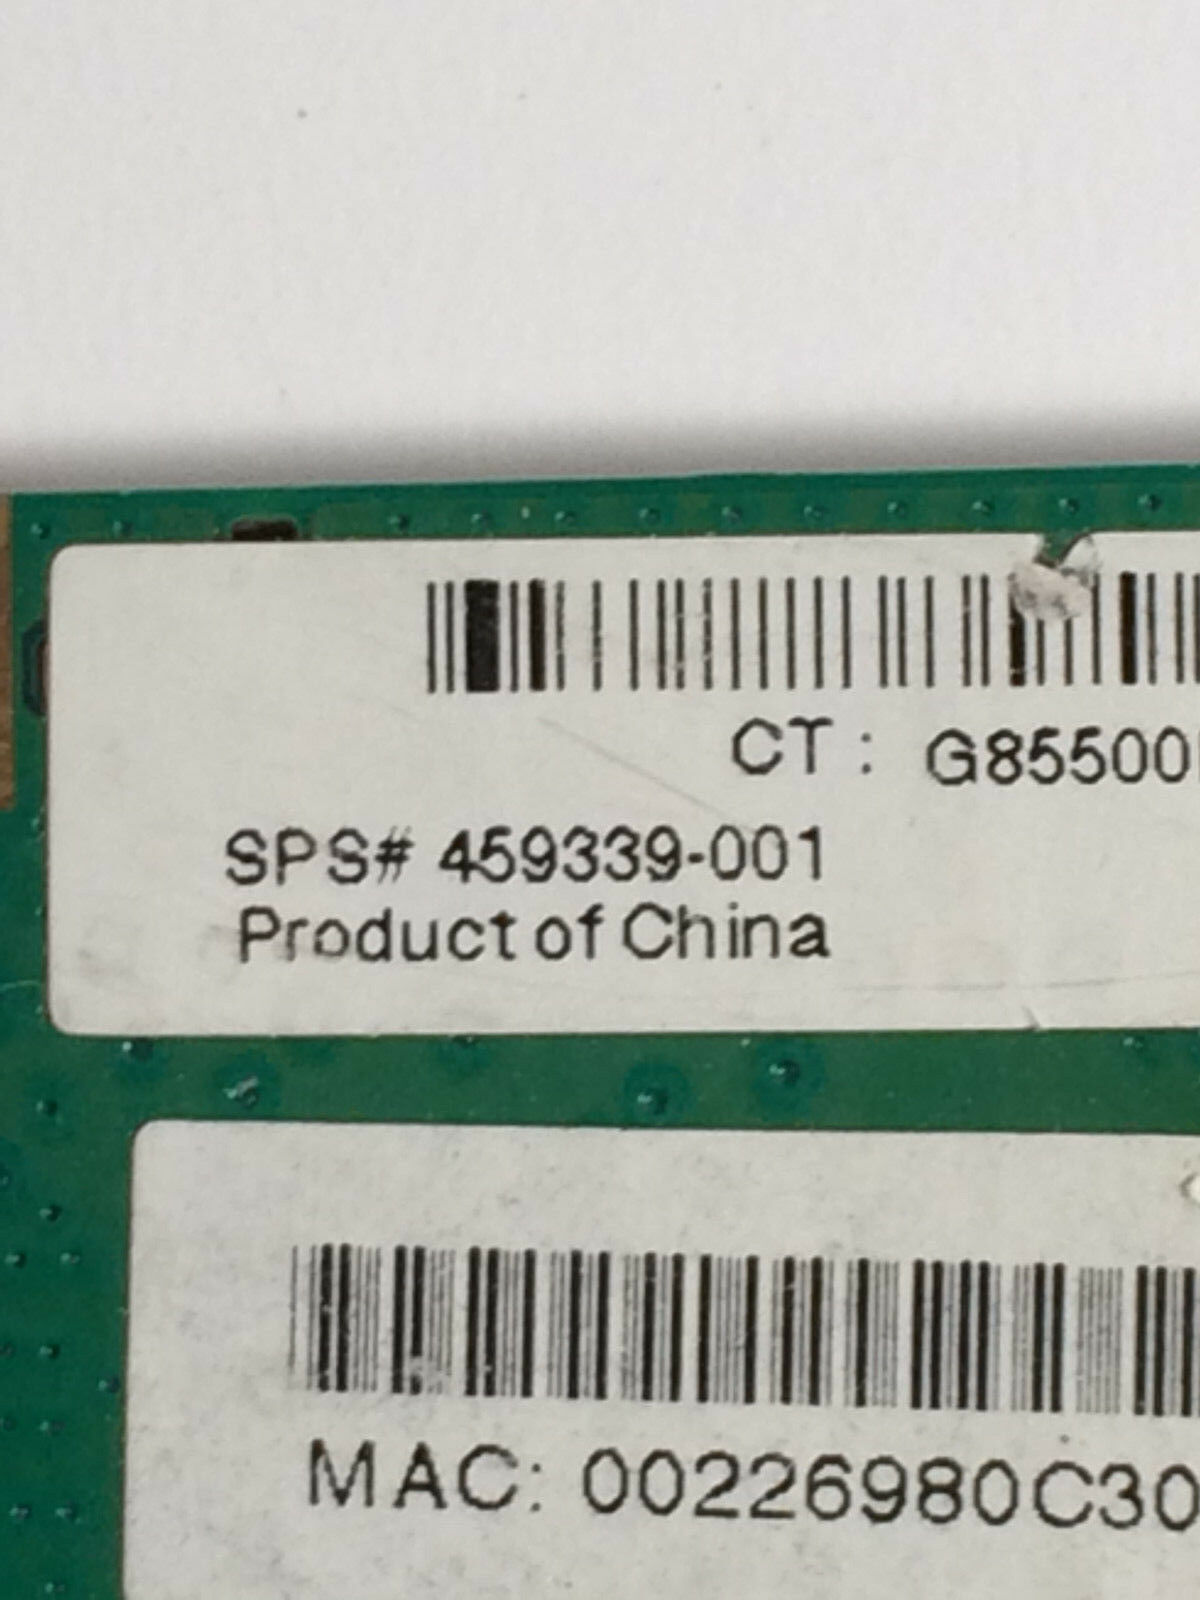 HP 459339-001 Pavilion dv6000 dv9000 g50 802.11b/g Mini PCI Wireless WI-FI Card image 4